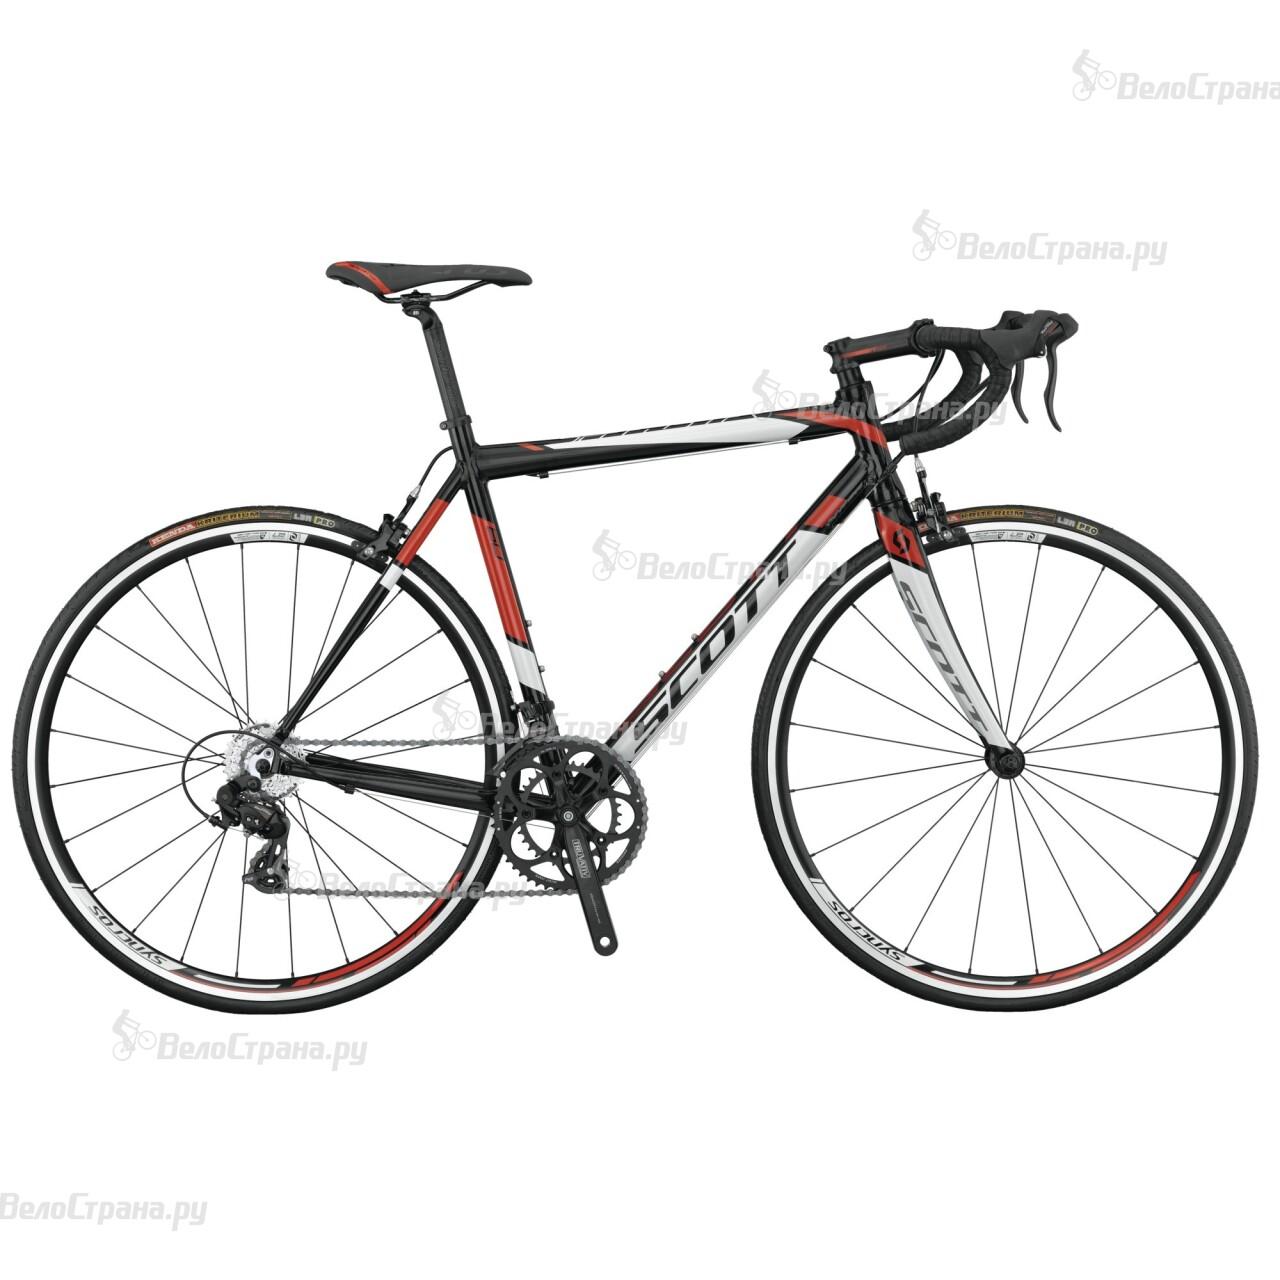 Велосипед Scott Speedster 60 Compact (2015) scott addict sl compact 2015